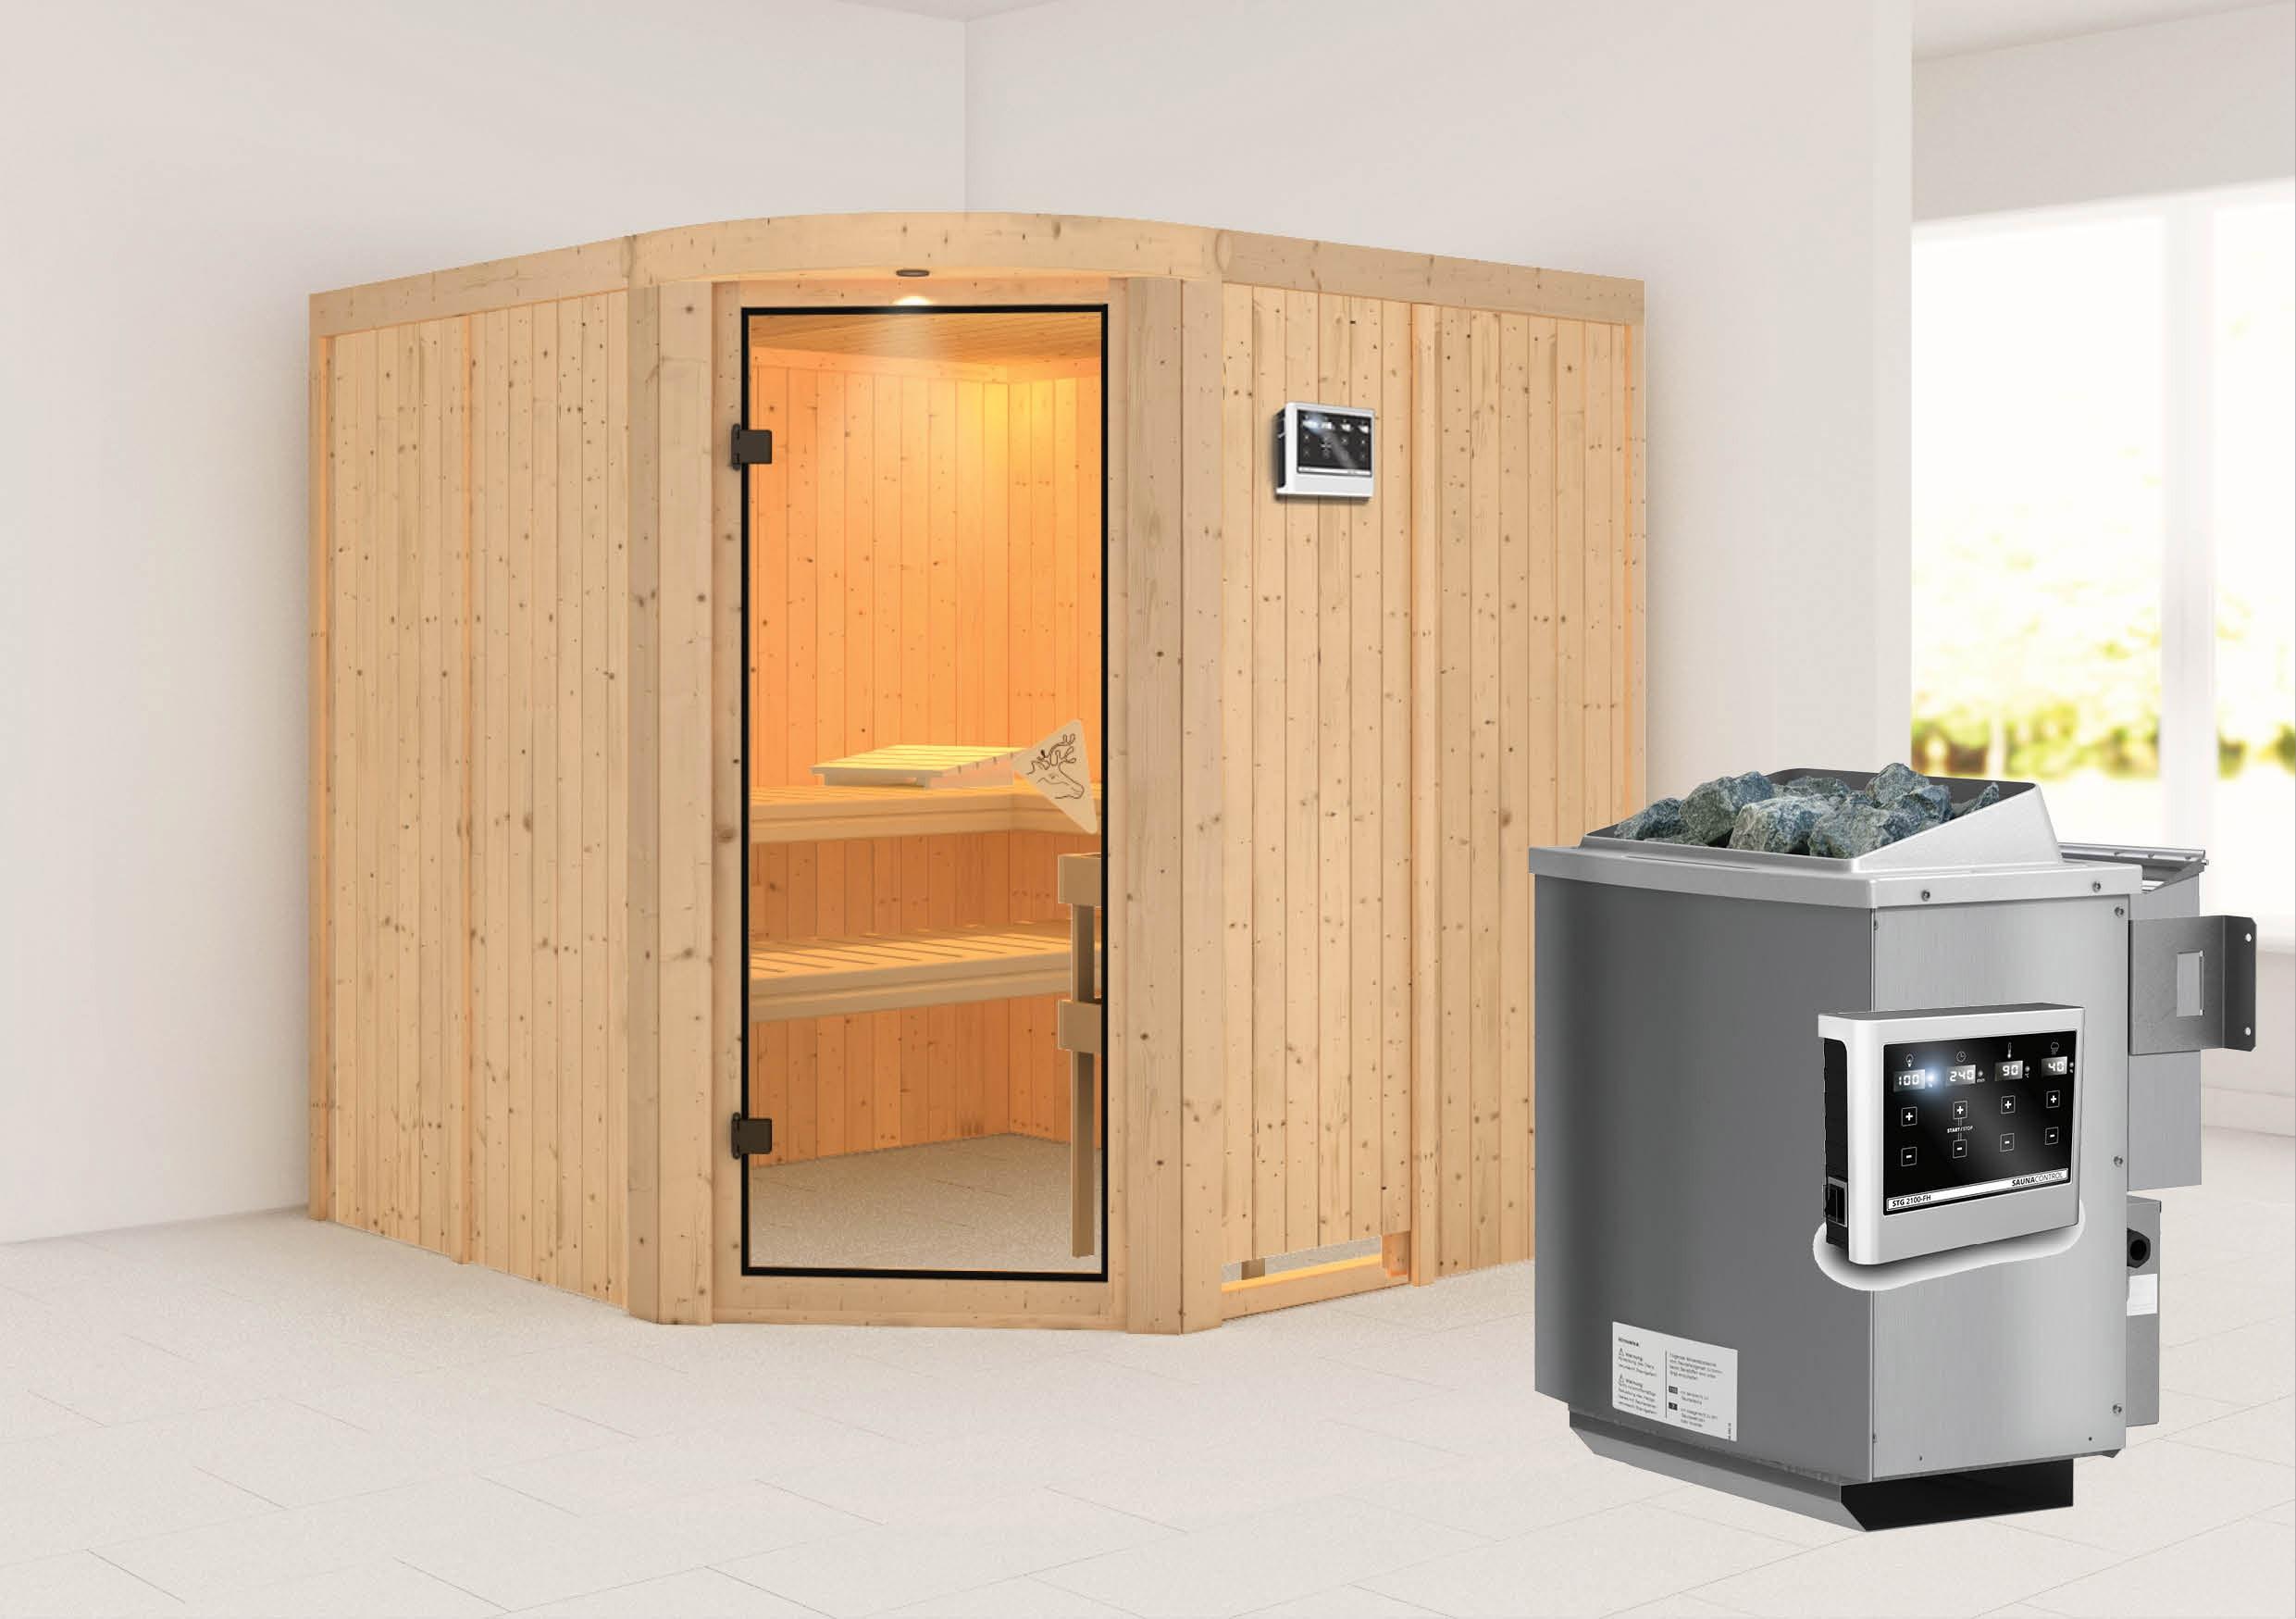 Karibu Sauna Aukura 68mm mit Bio Ofen 9kW extern classic Tür Bild 1